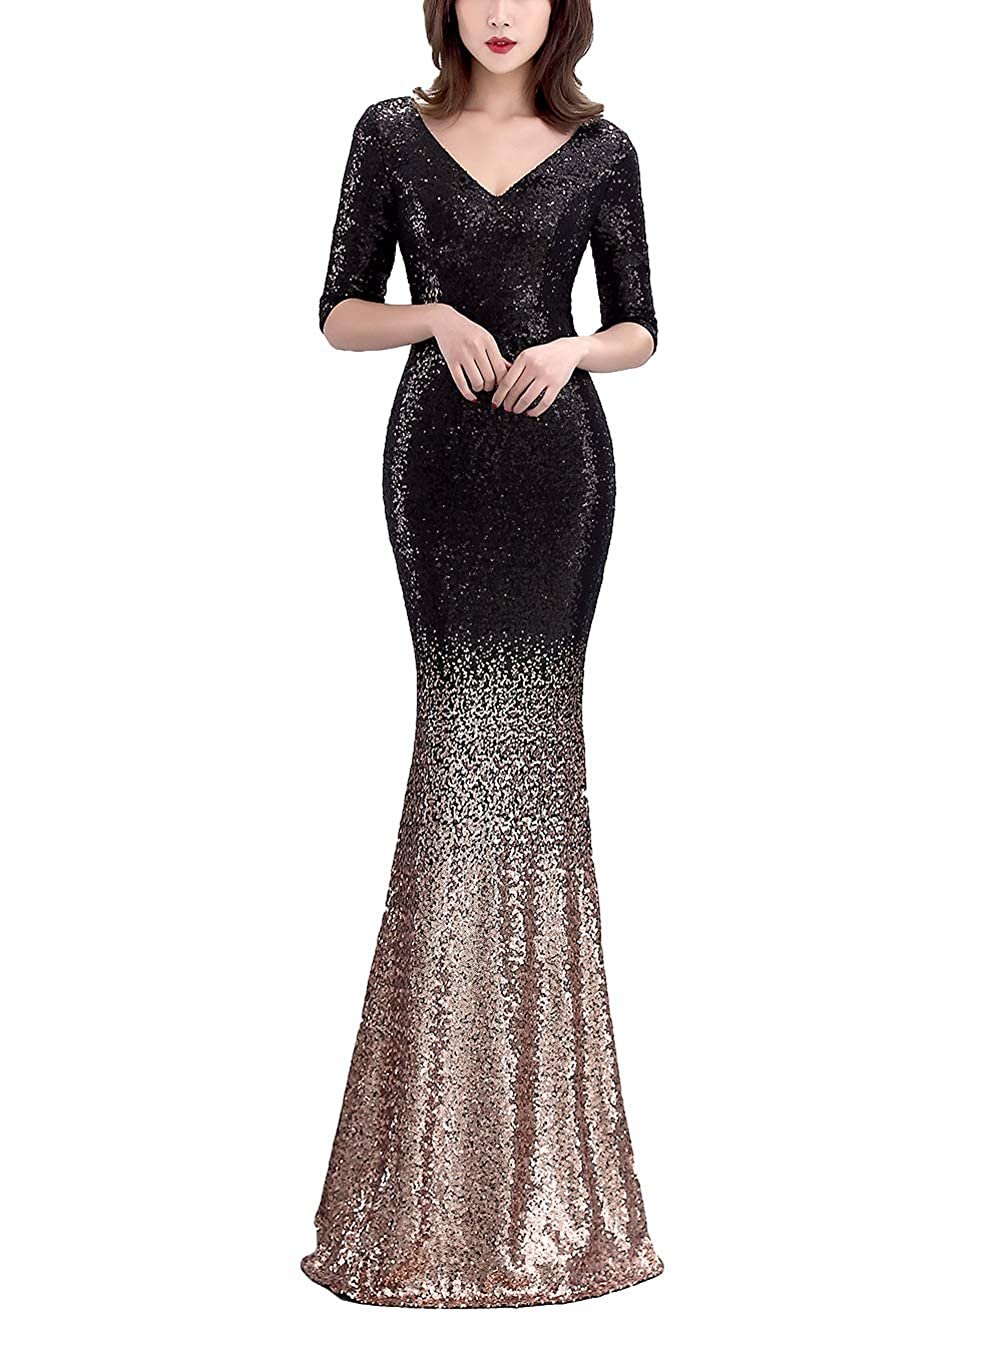 16116blackgold Chowsir Women Sexy Elegant Slim Sequin Long Cocktail Party Evening Dress